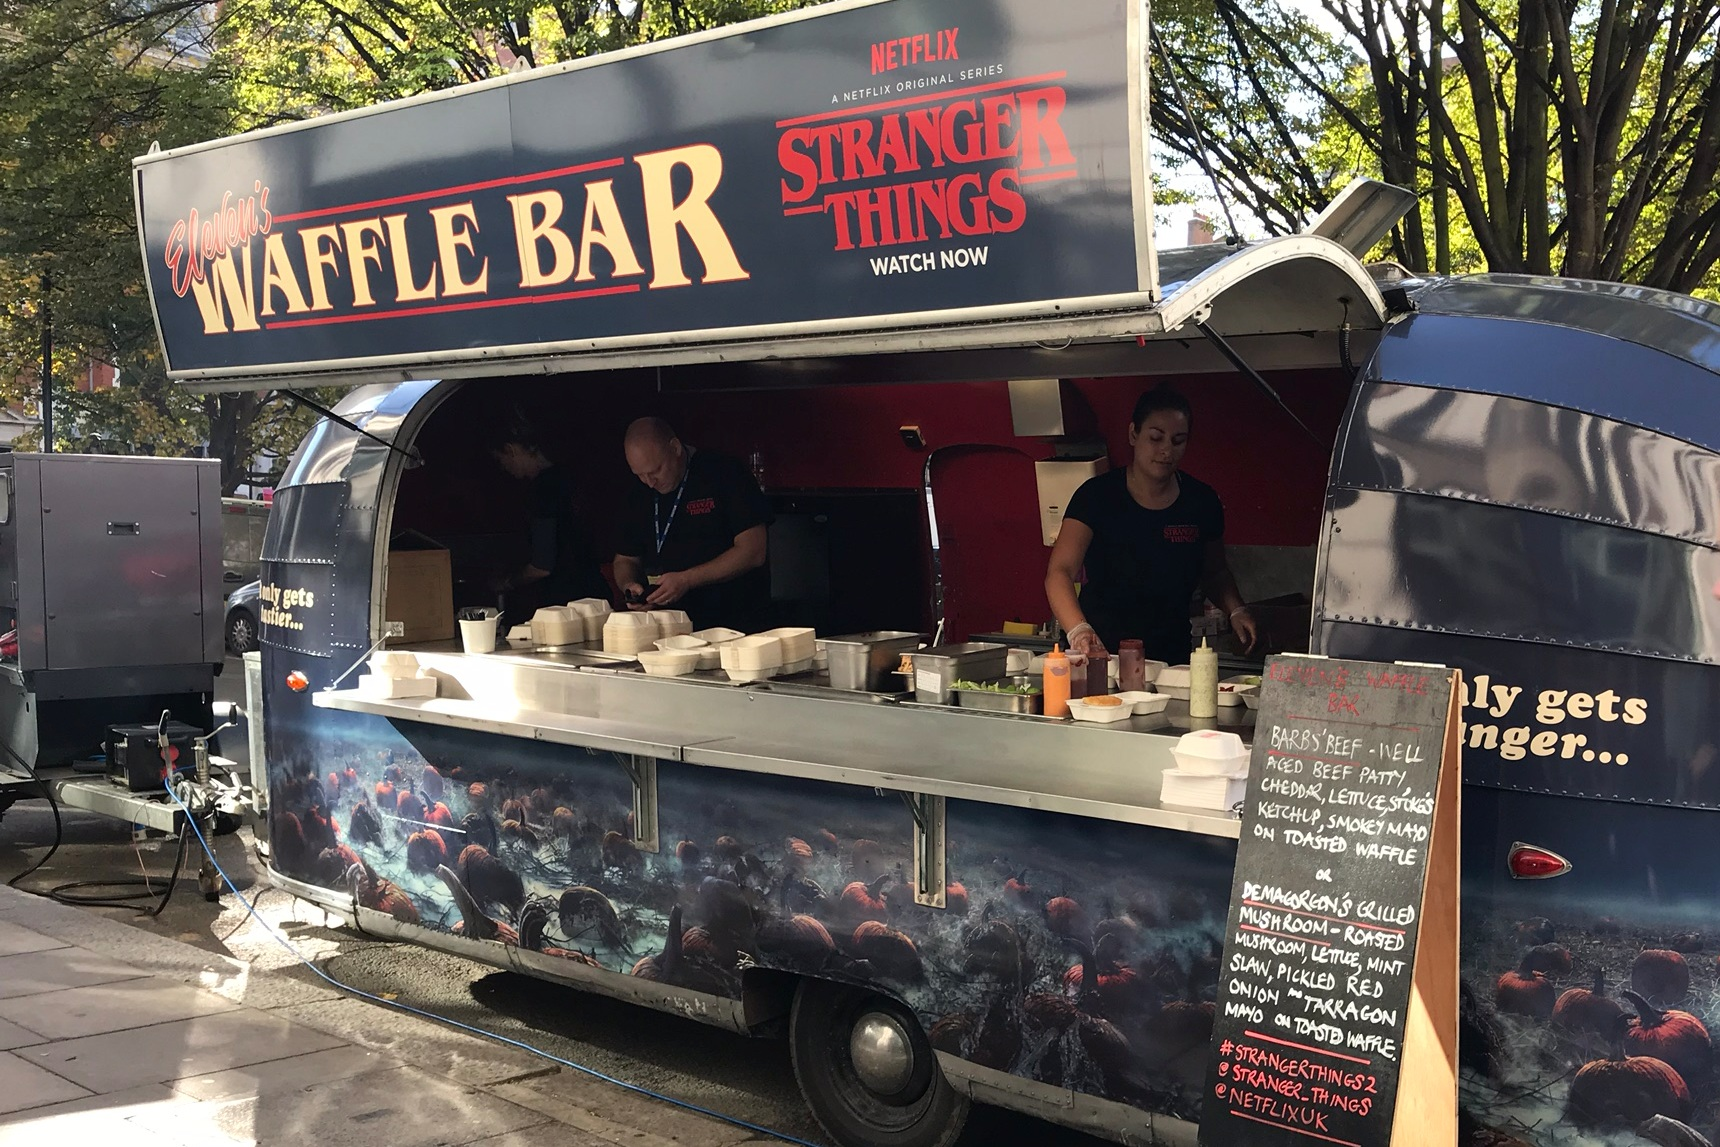 themed & branded food truck treats - NETFLIX - STRANGER THINGS 2